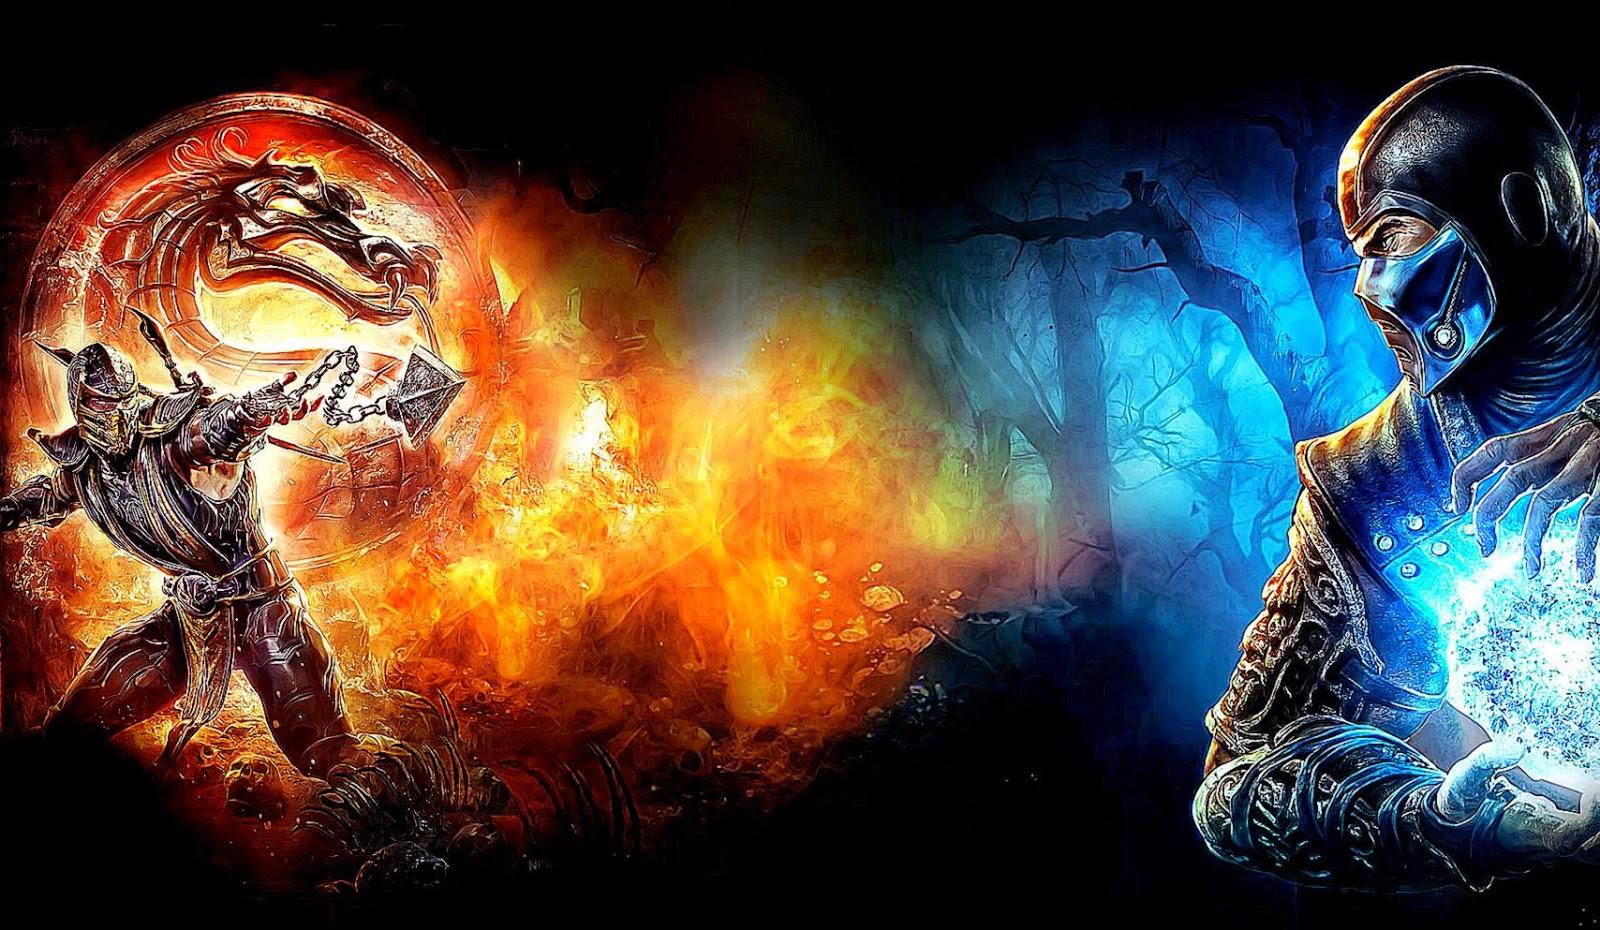 156 Mortal Kombat Wallpapers  Mortal Kombat Backgrounds